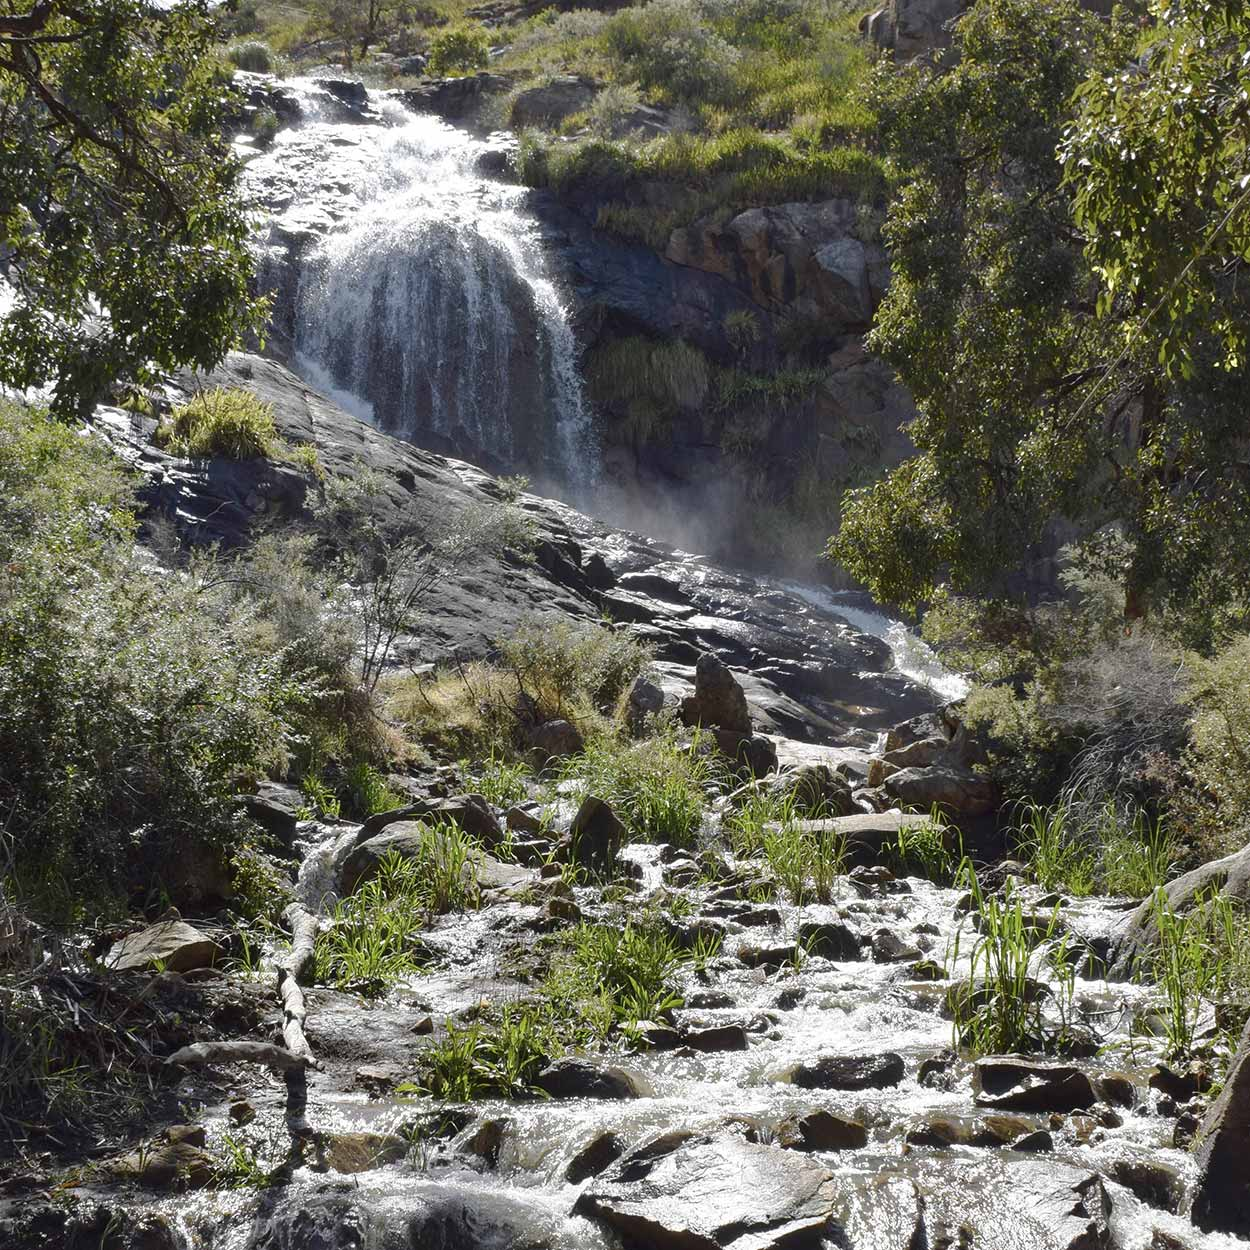 Lesmurdie Falls and Lesmurdie Brook, Mundy Regional Park, Perth, Western Australia